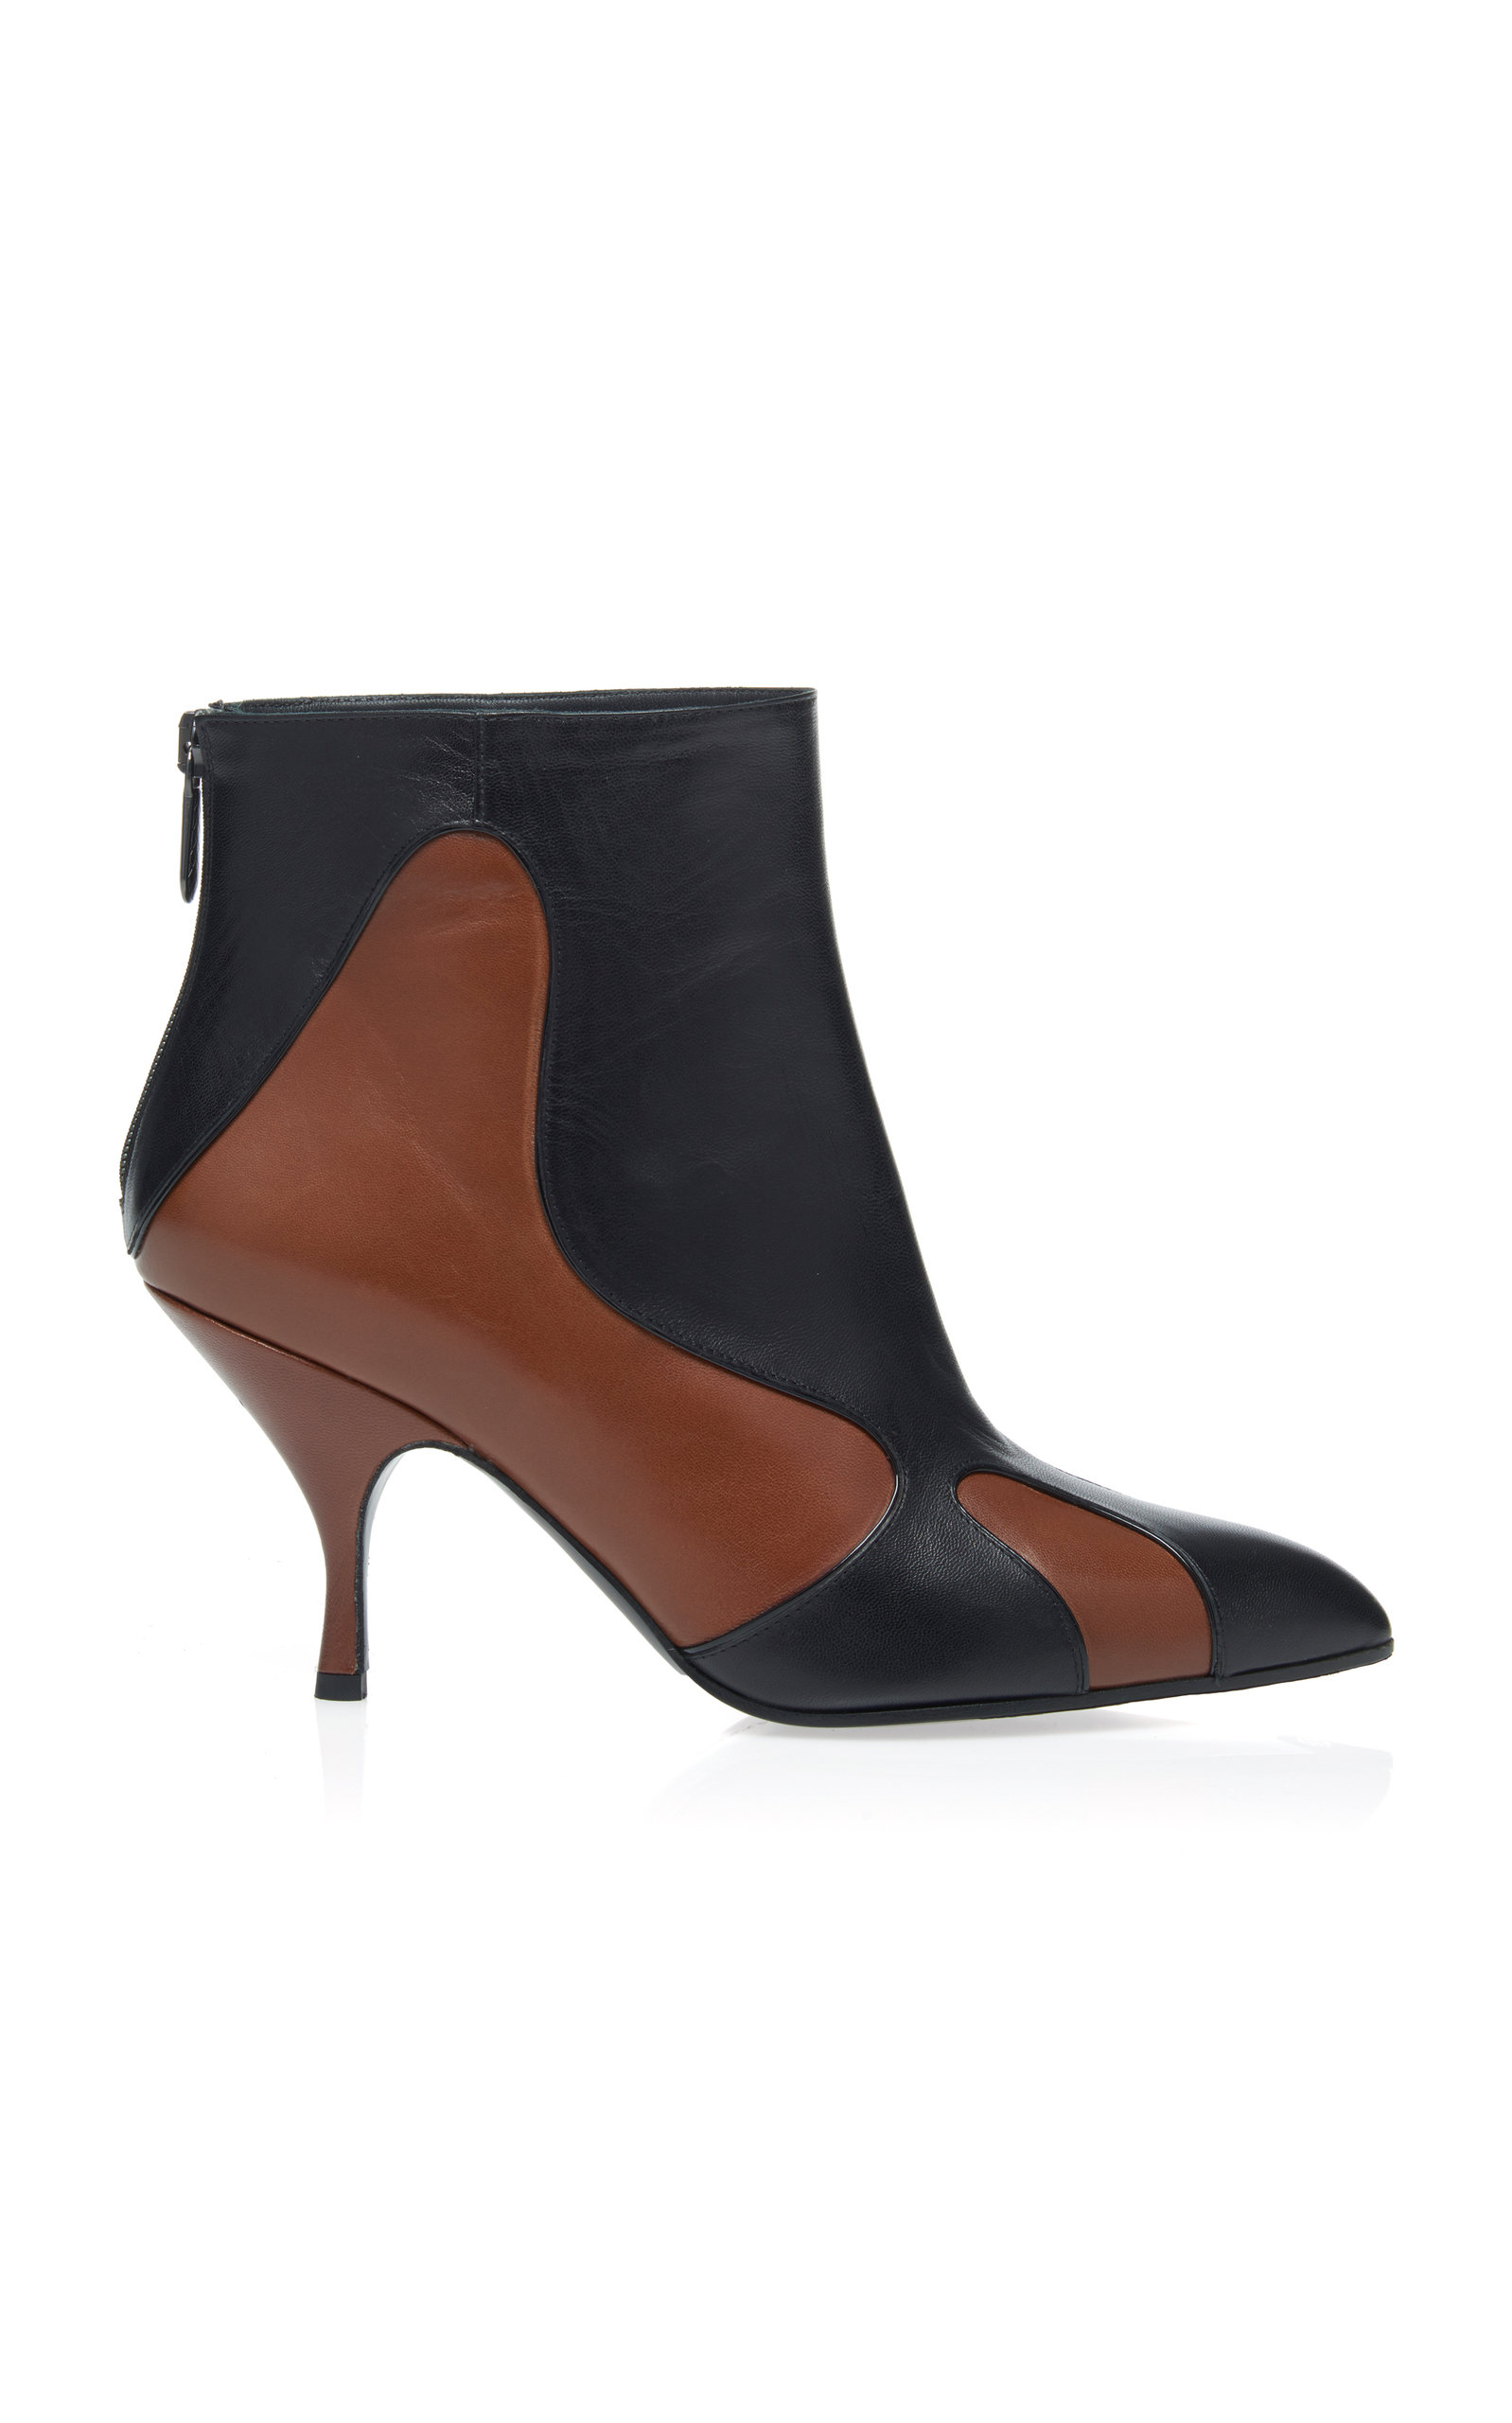 Bottega Veneta Flame Paneled-Leather Ankle Boots 6xdER